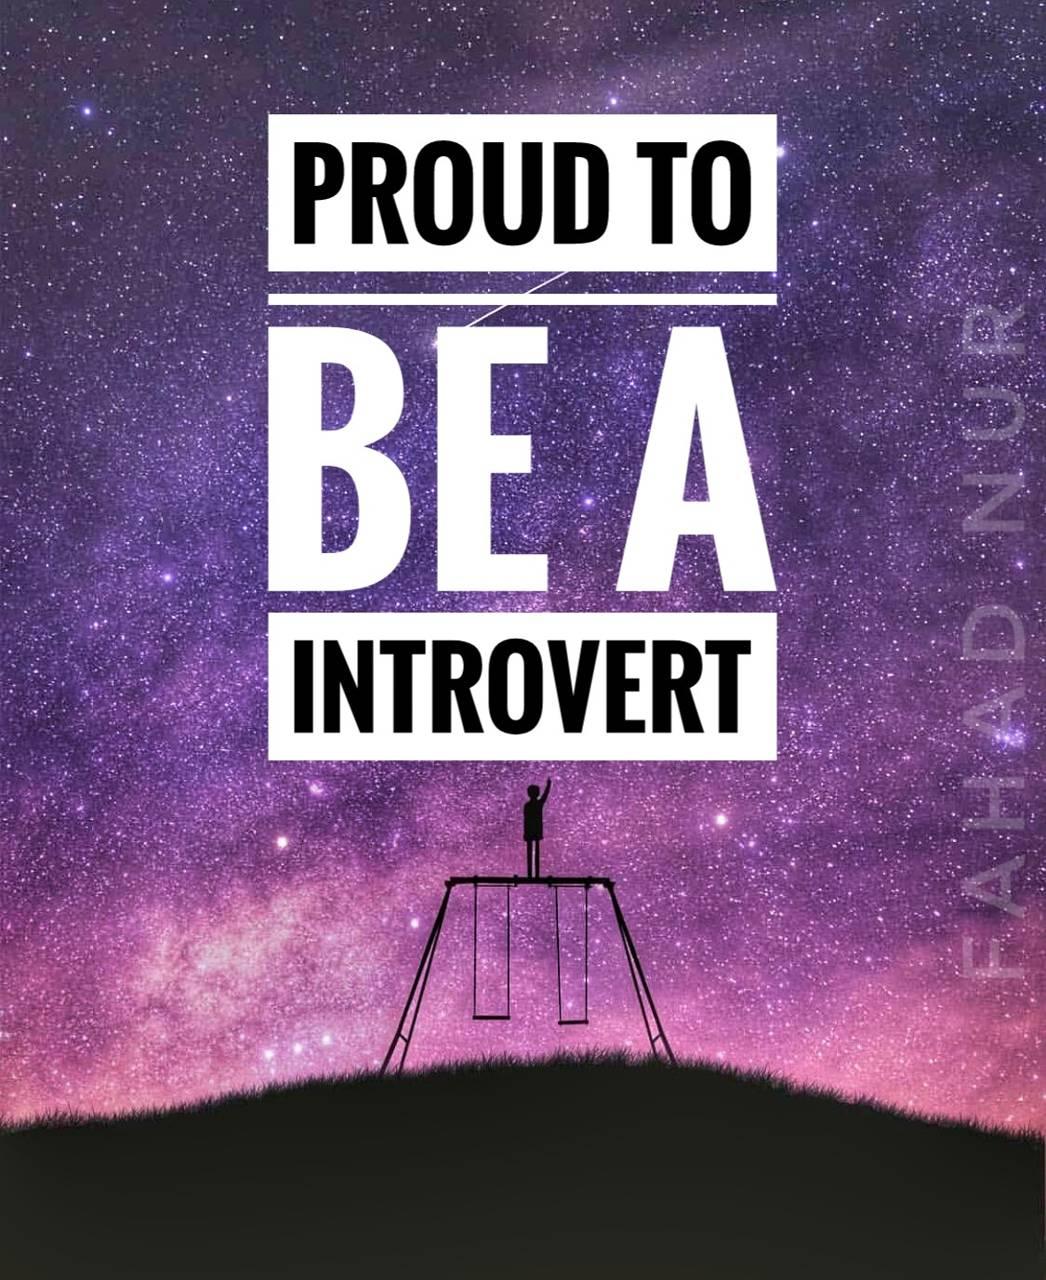 город обои интроверт на телефон думаете